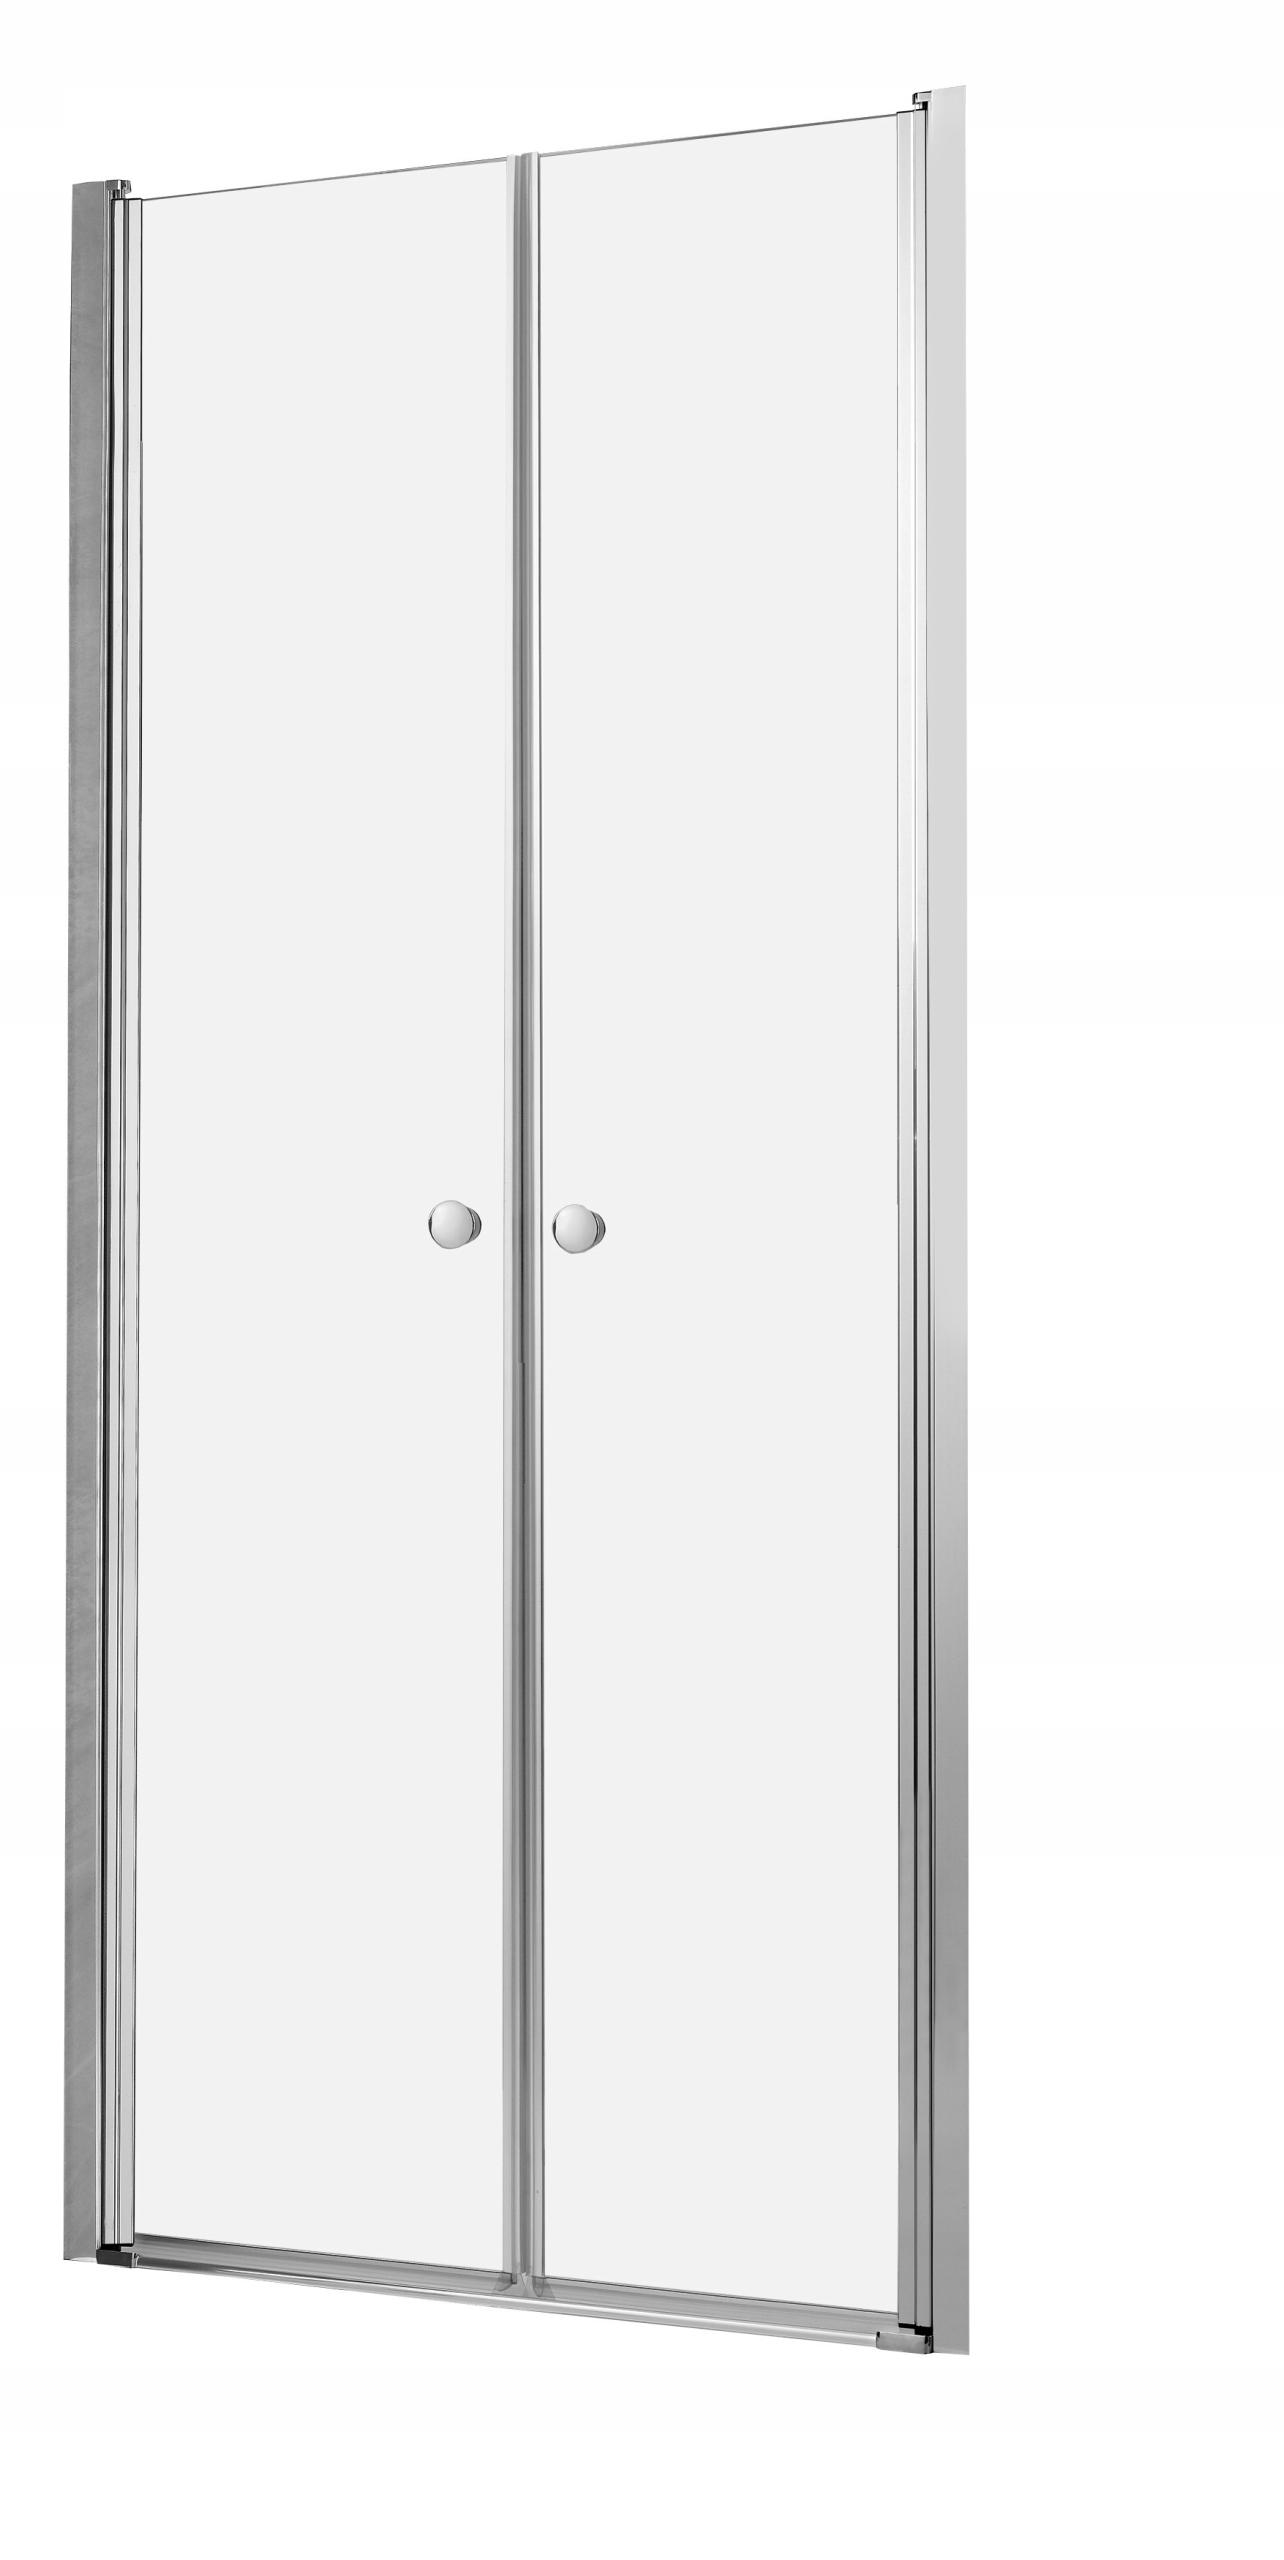 Sprchové dvere EOS DWD 120x197 intimato cl